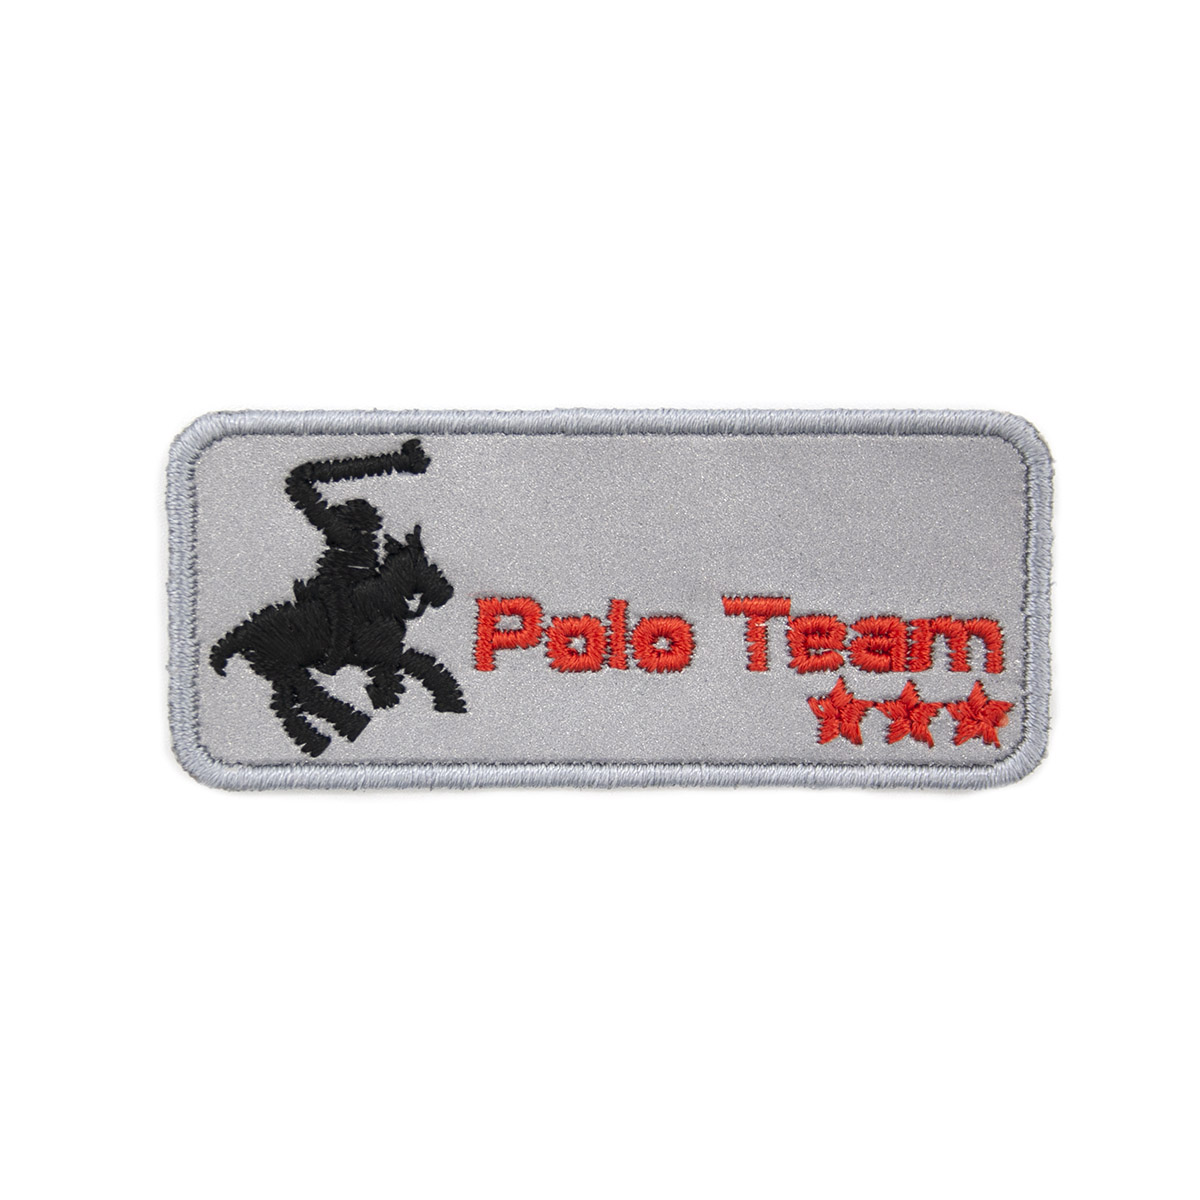 AD1387SV Термоаппликация, Polo Team, 3*7 см, Hobby&Pro